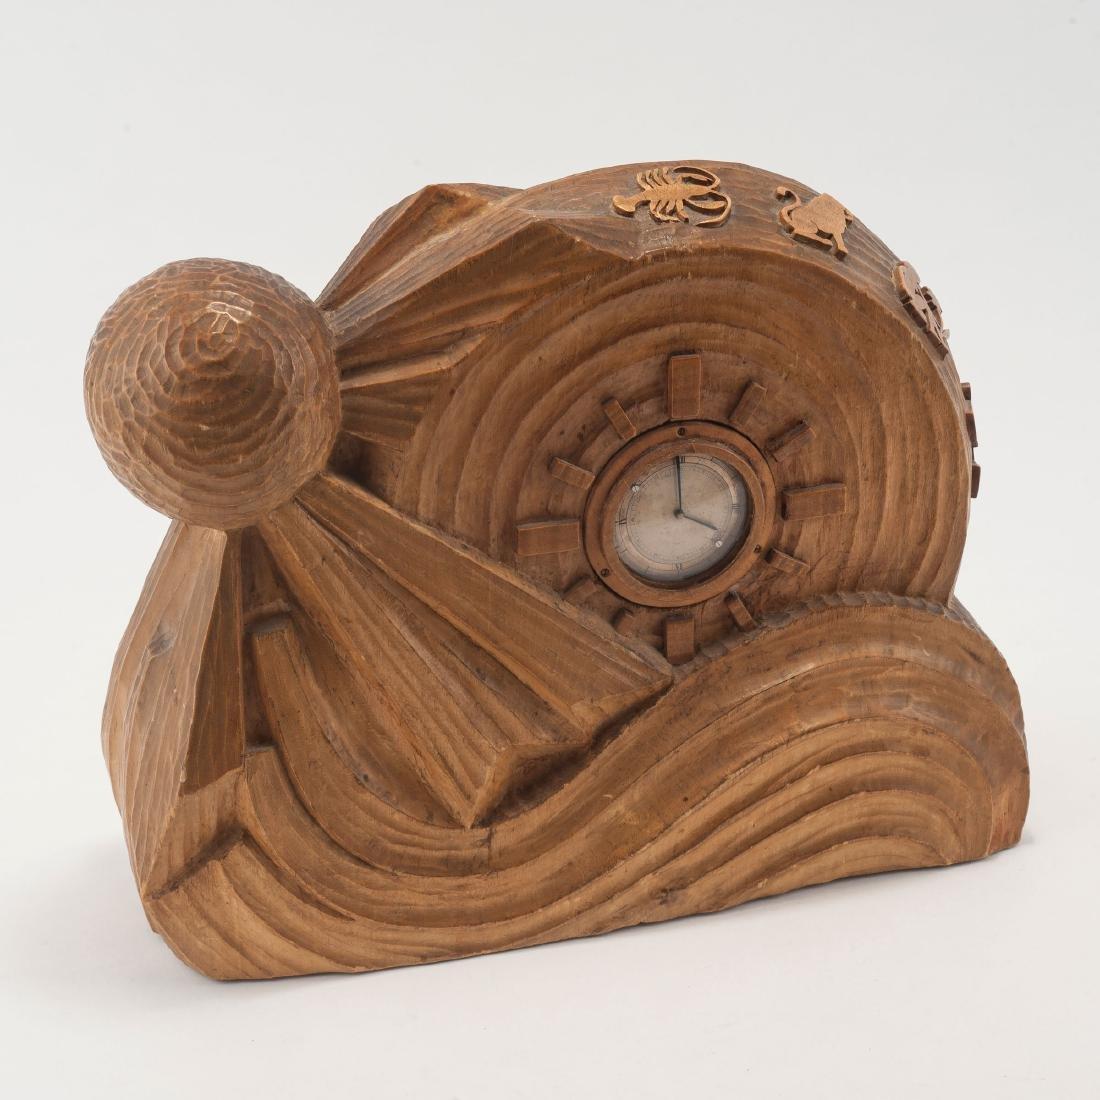 Anthroposophic table clock, 1920s - 2